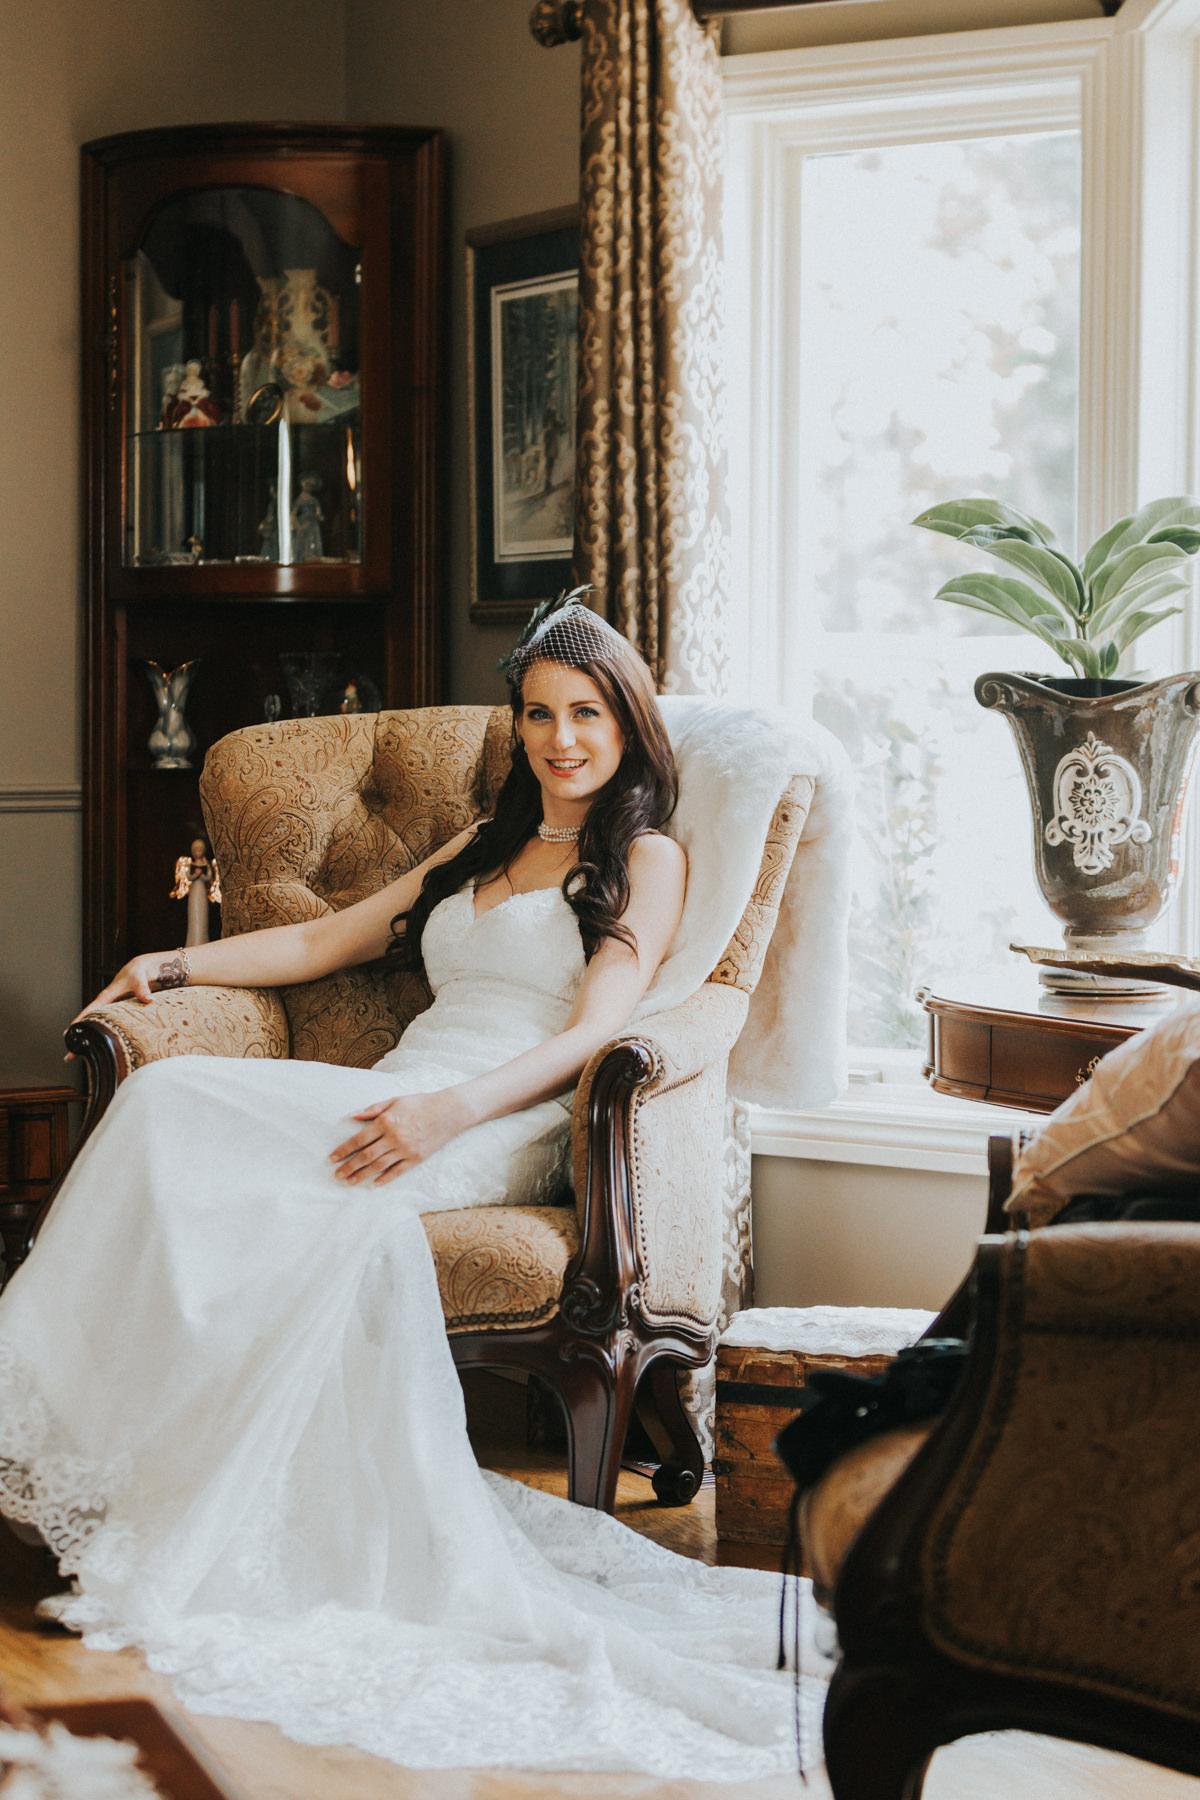 Vancouver wedding photographer - Pam 10